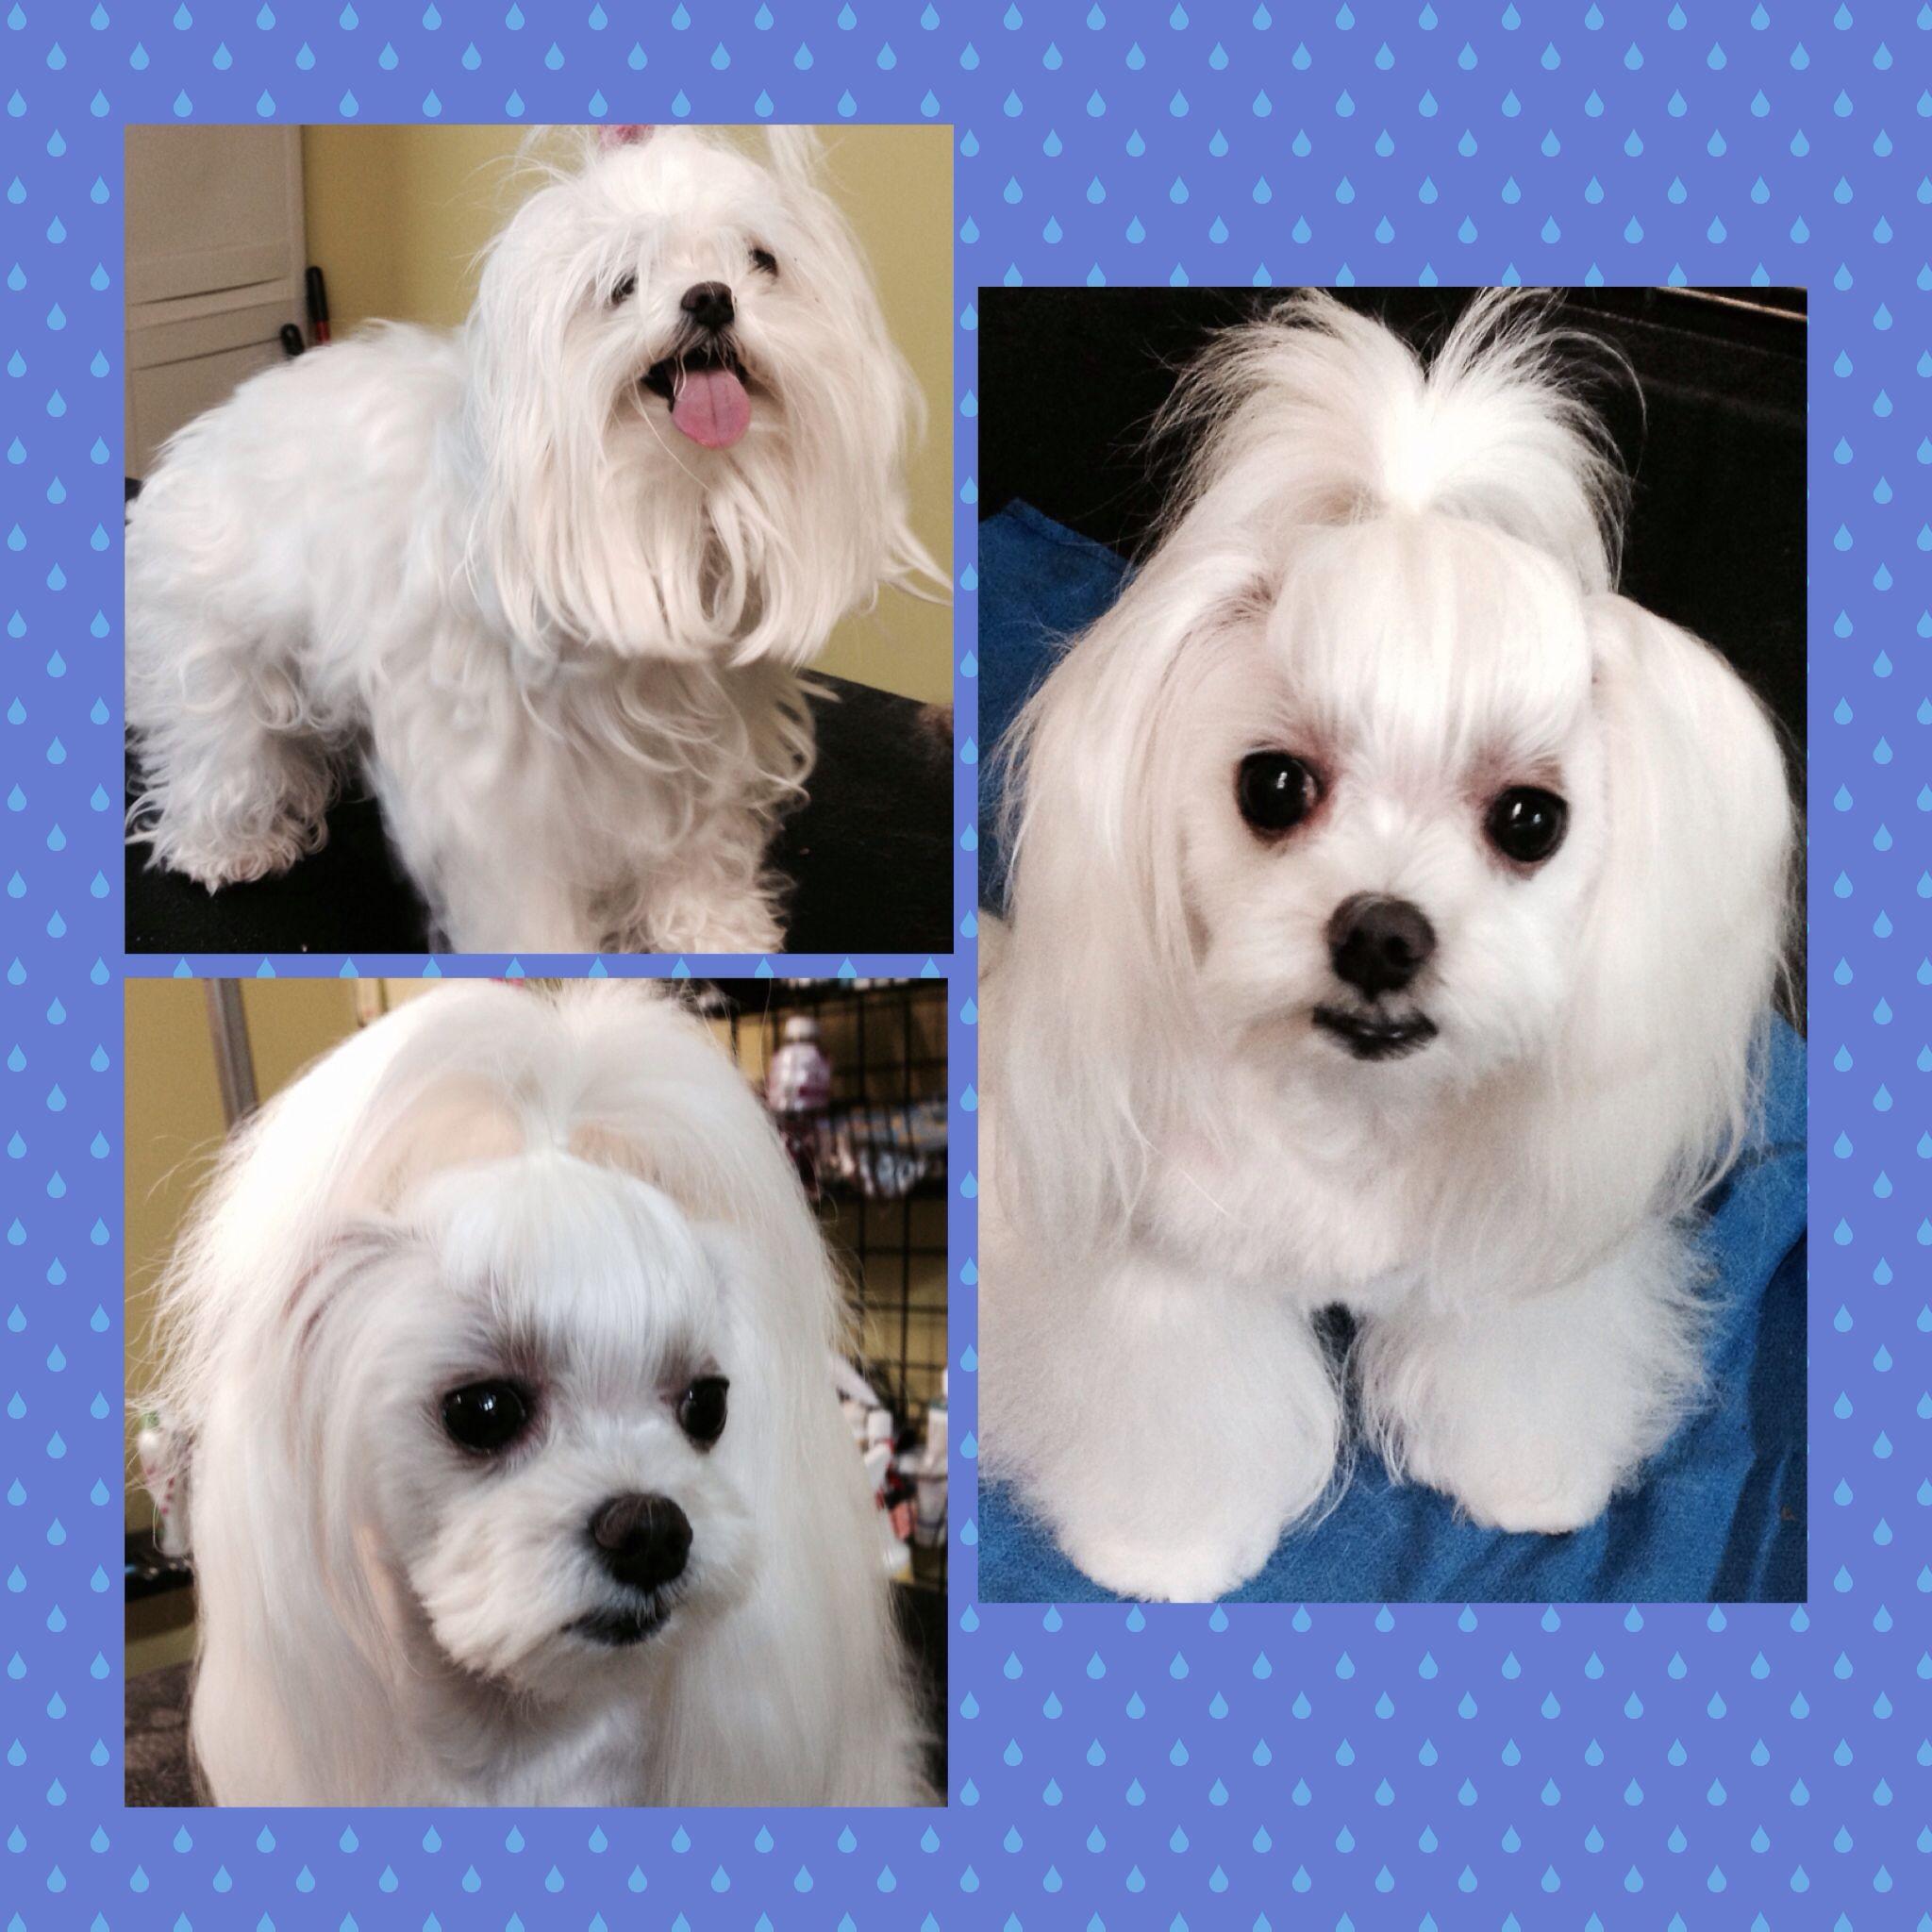 Creative grooming creative grooming maltese puppy dog